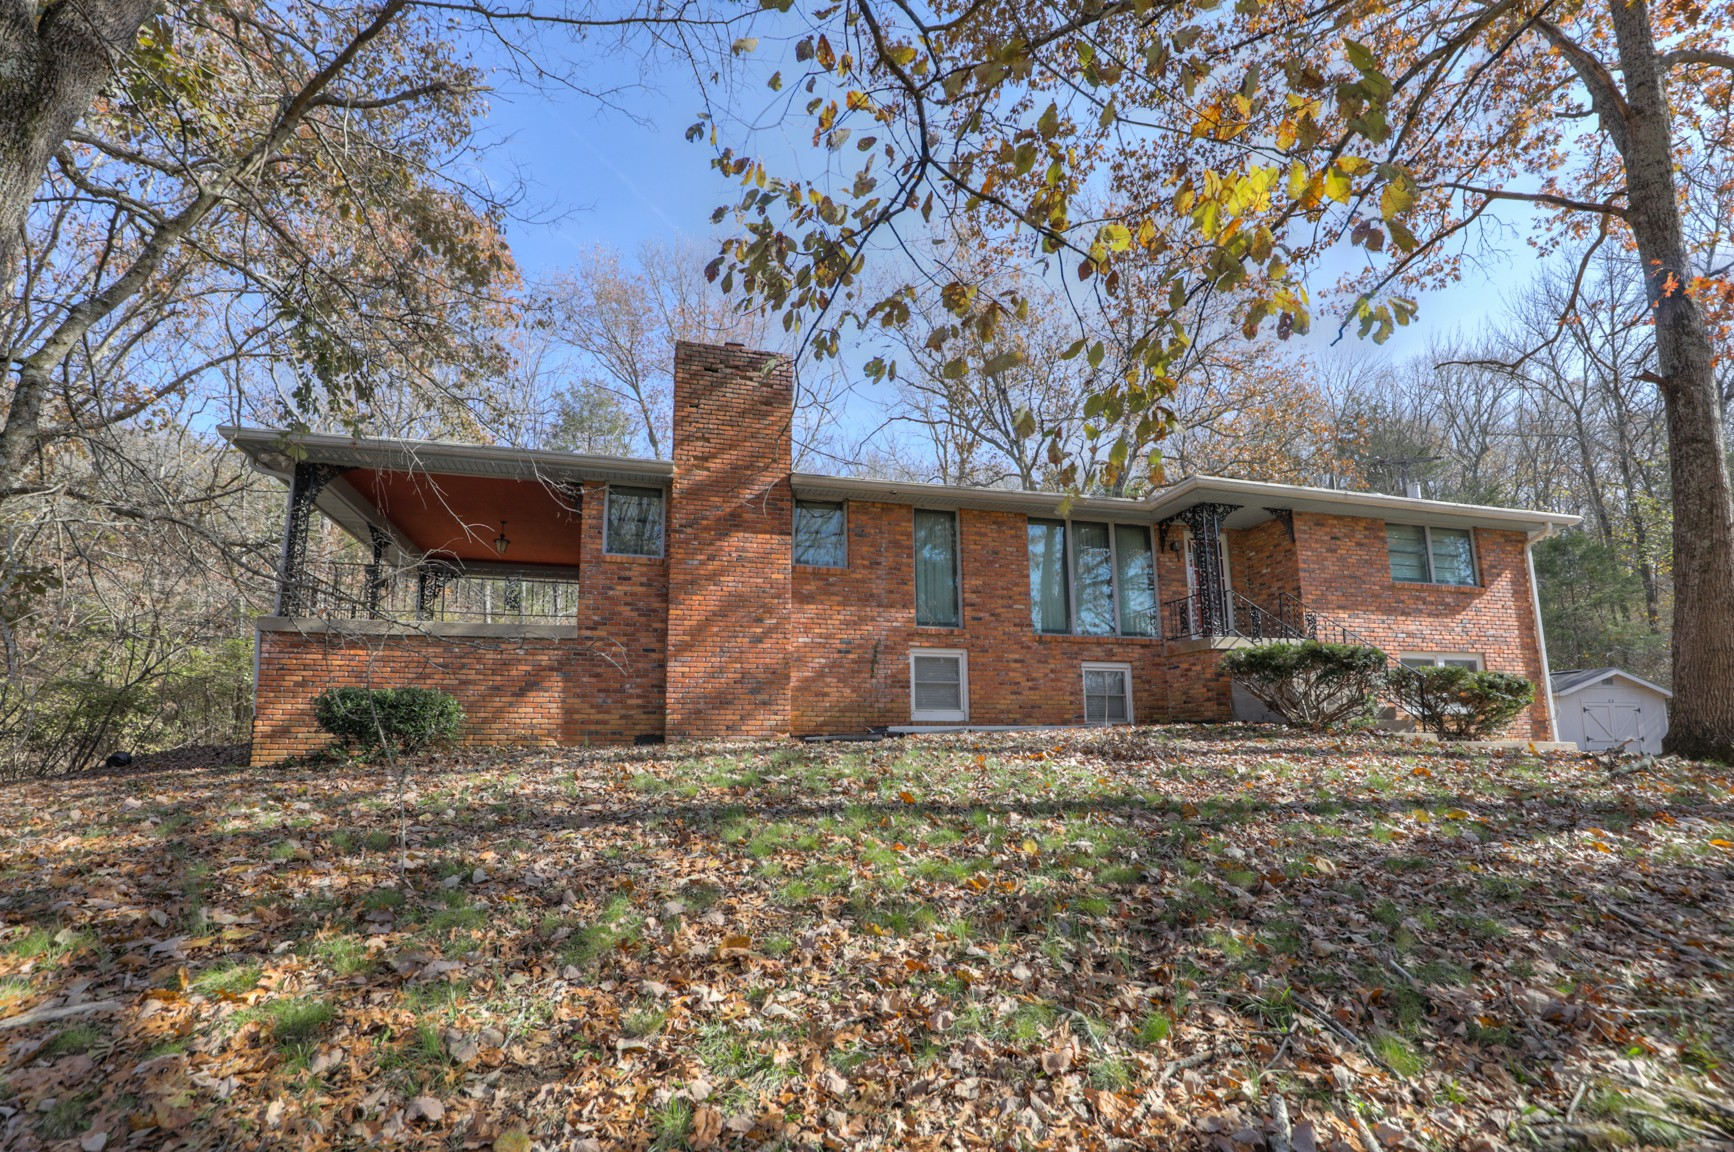 4558 Old Hickory Blvd Property Photo - Nashville, TN real estate listing